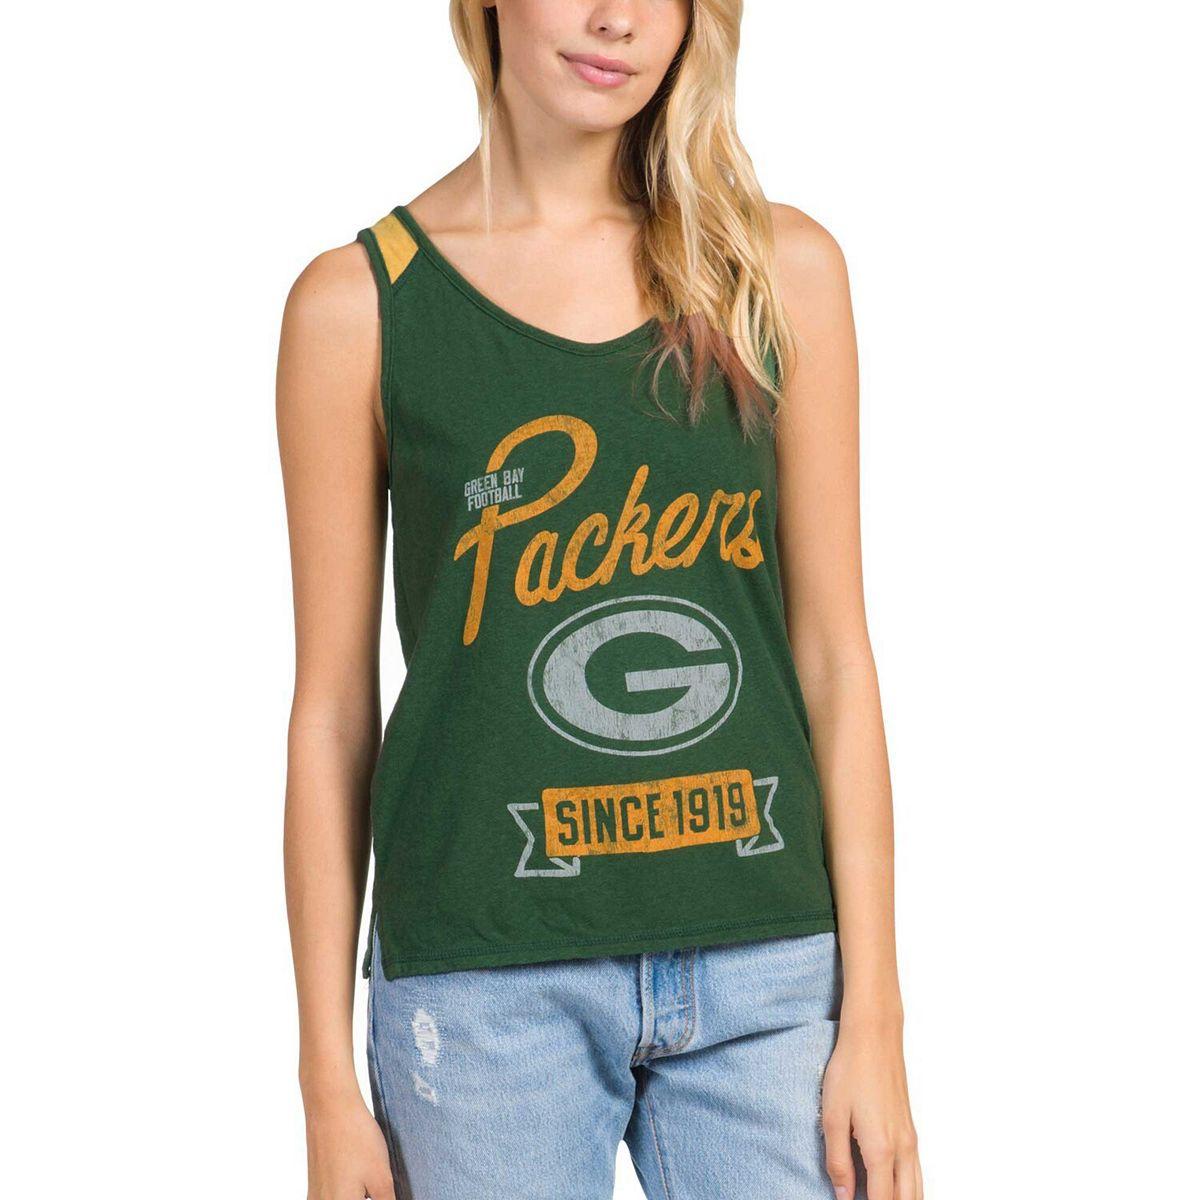 Women's Junk Food Green Green Bay Packers Sideline Tank Top QqU08